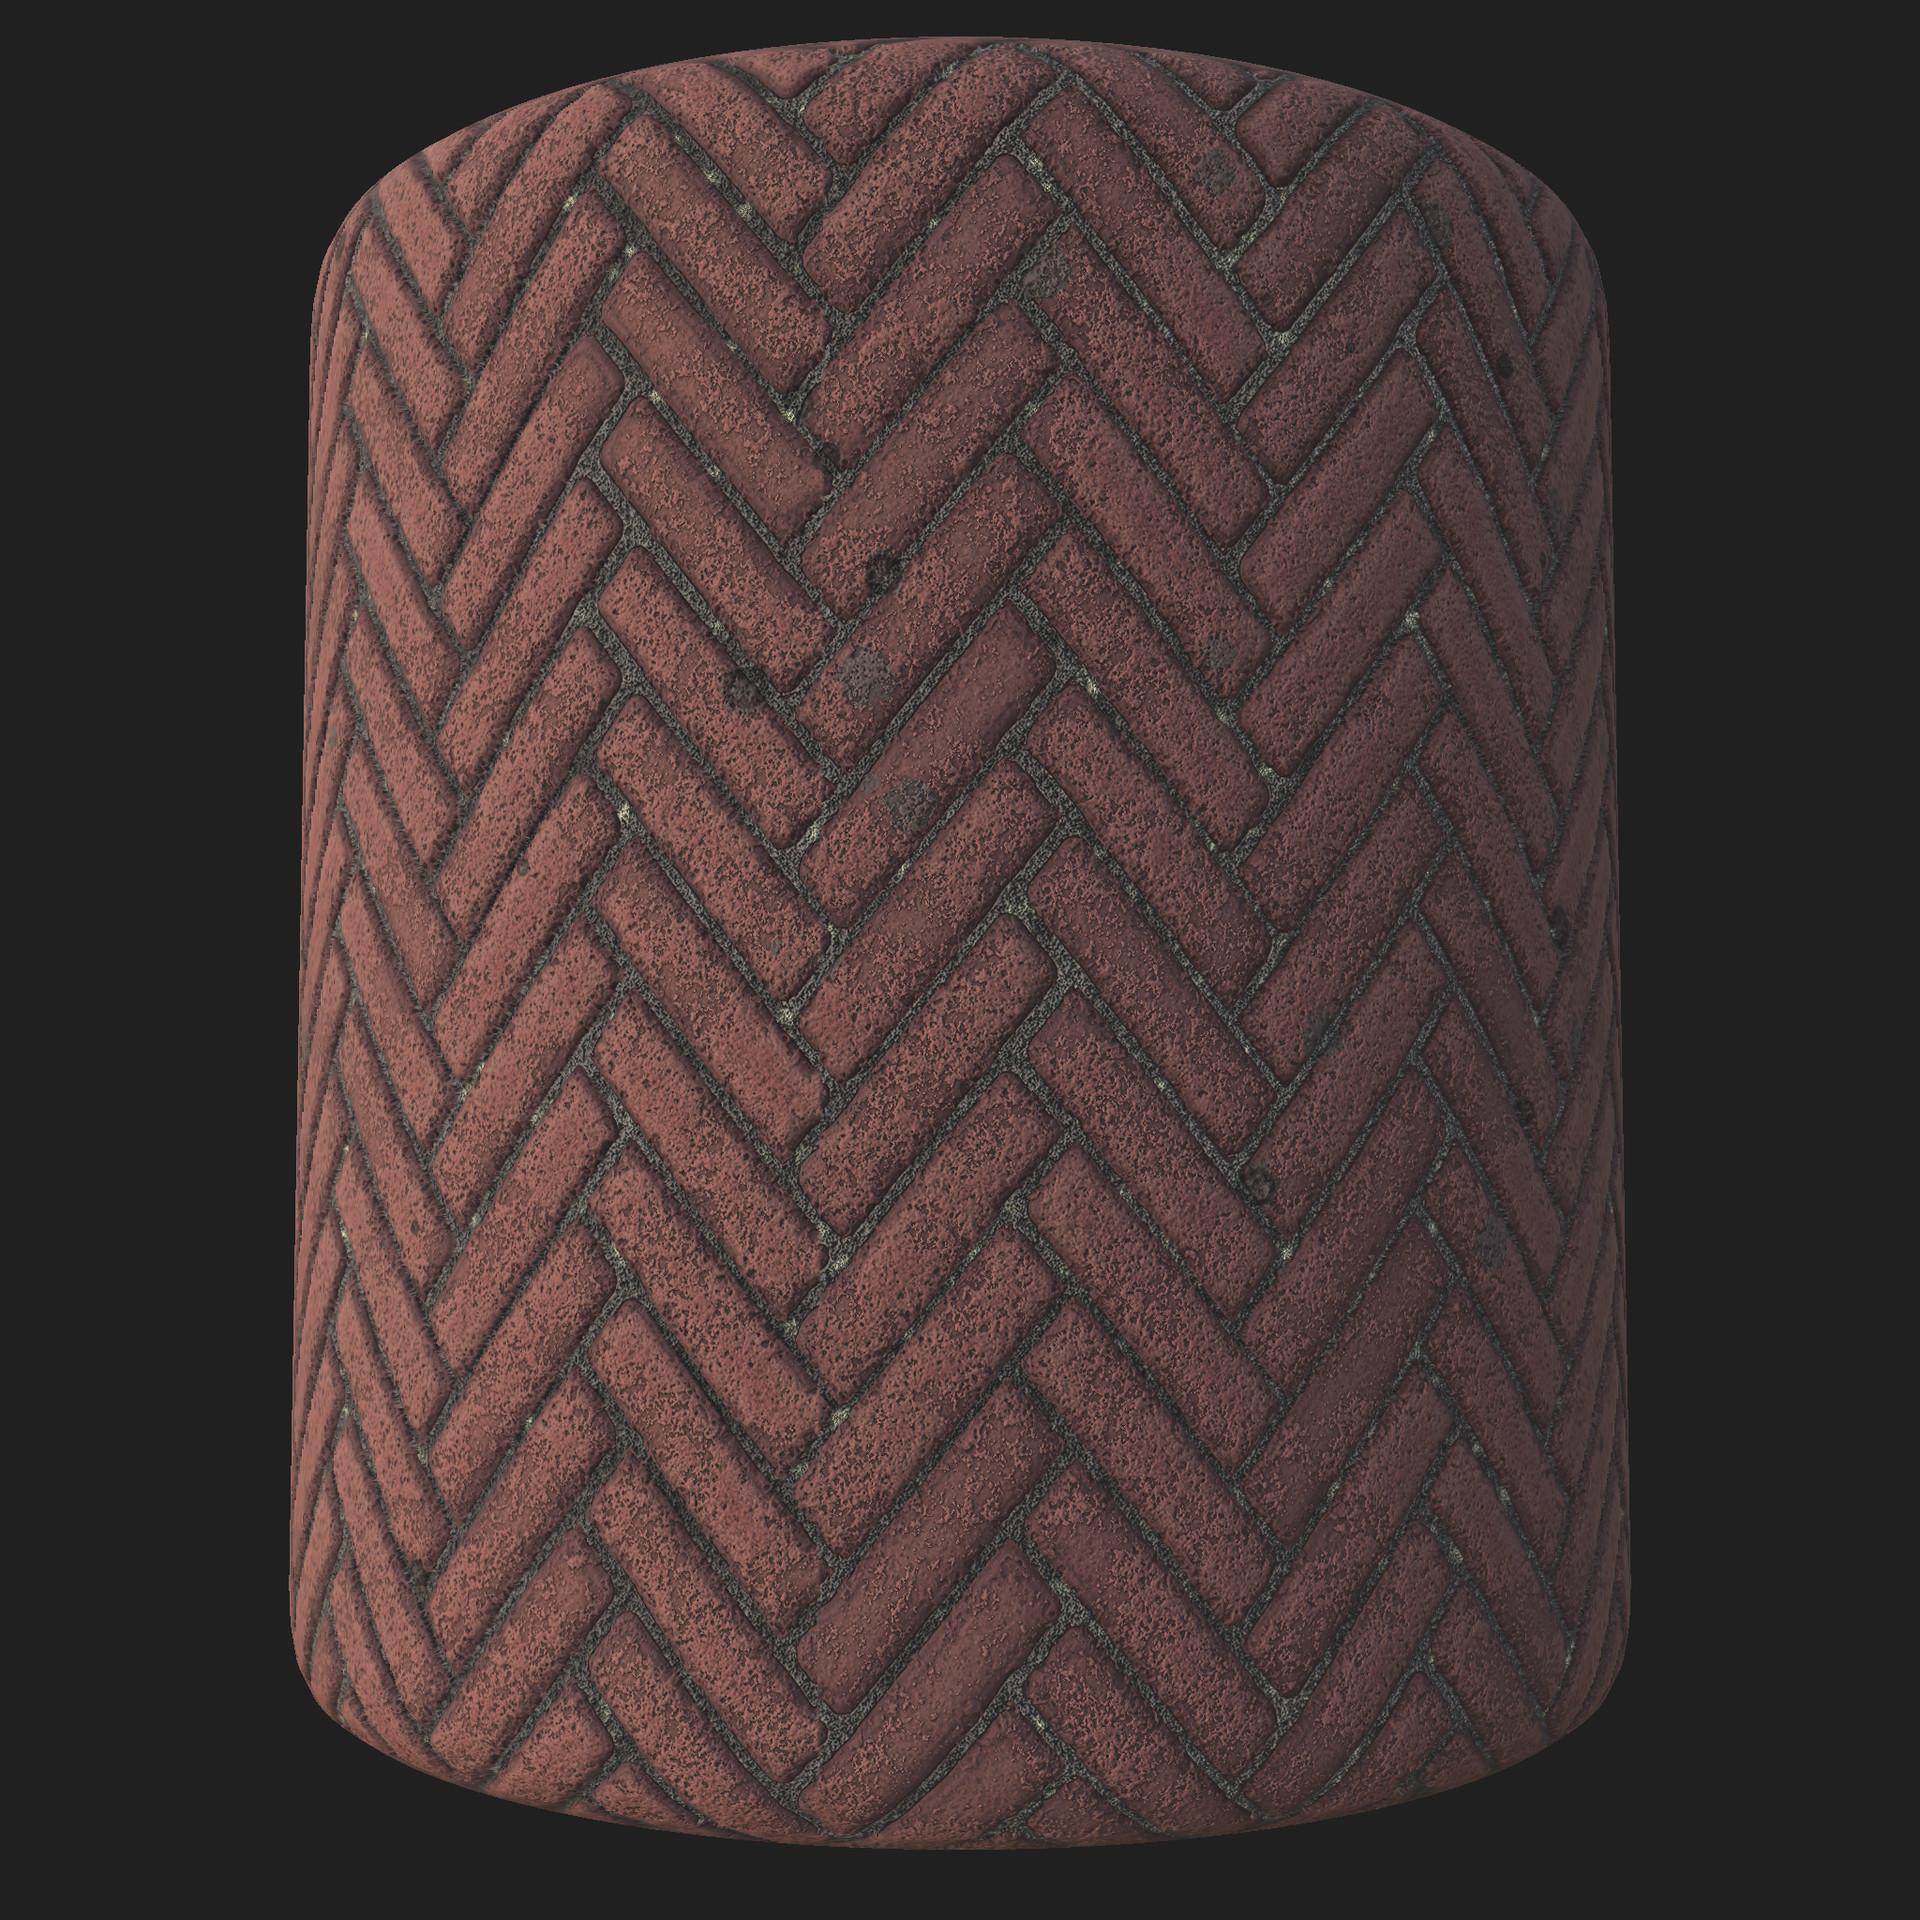 James ray sidewalk bricks 4